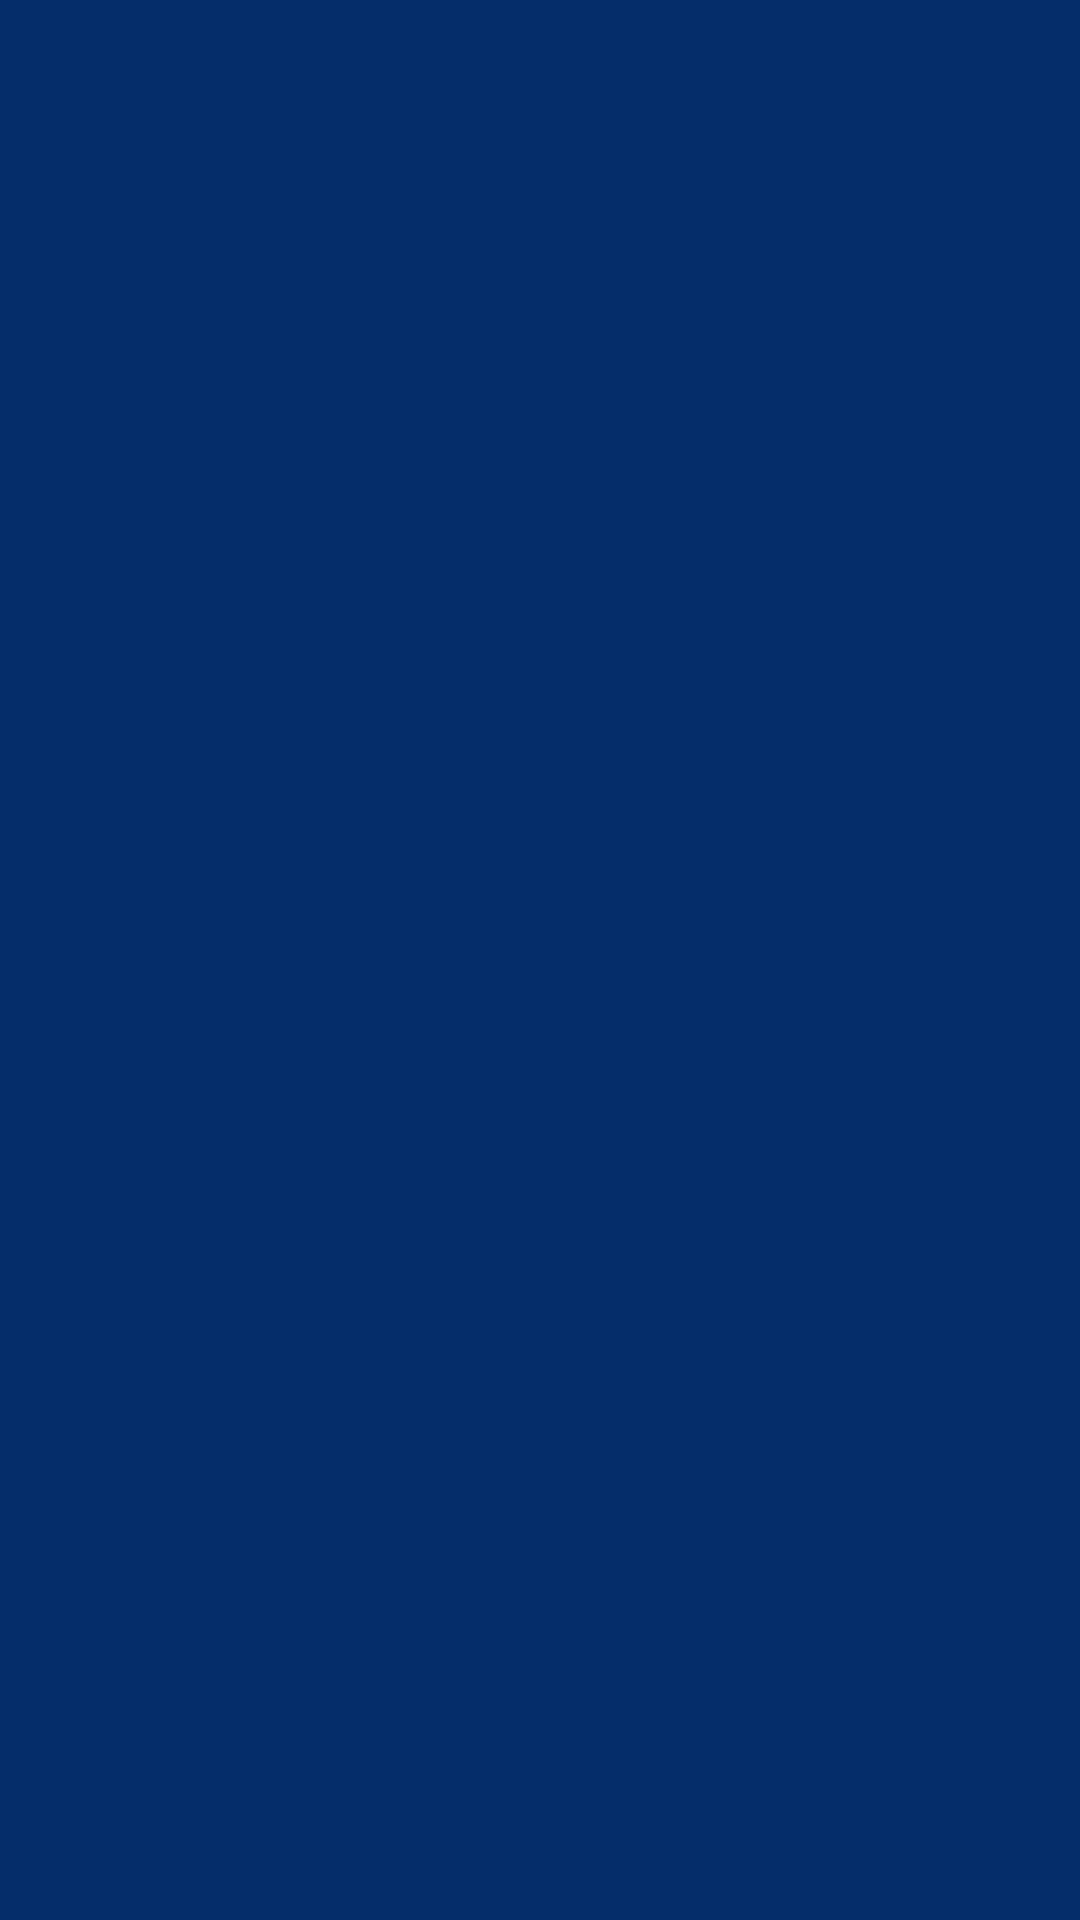 Solid Color Wallpaper Windows 10